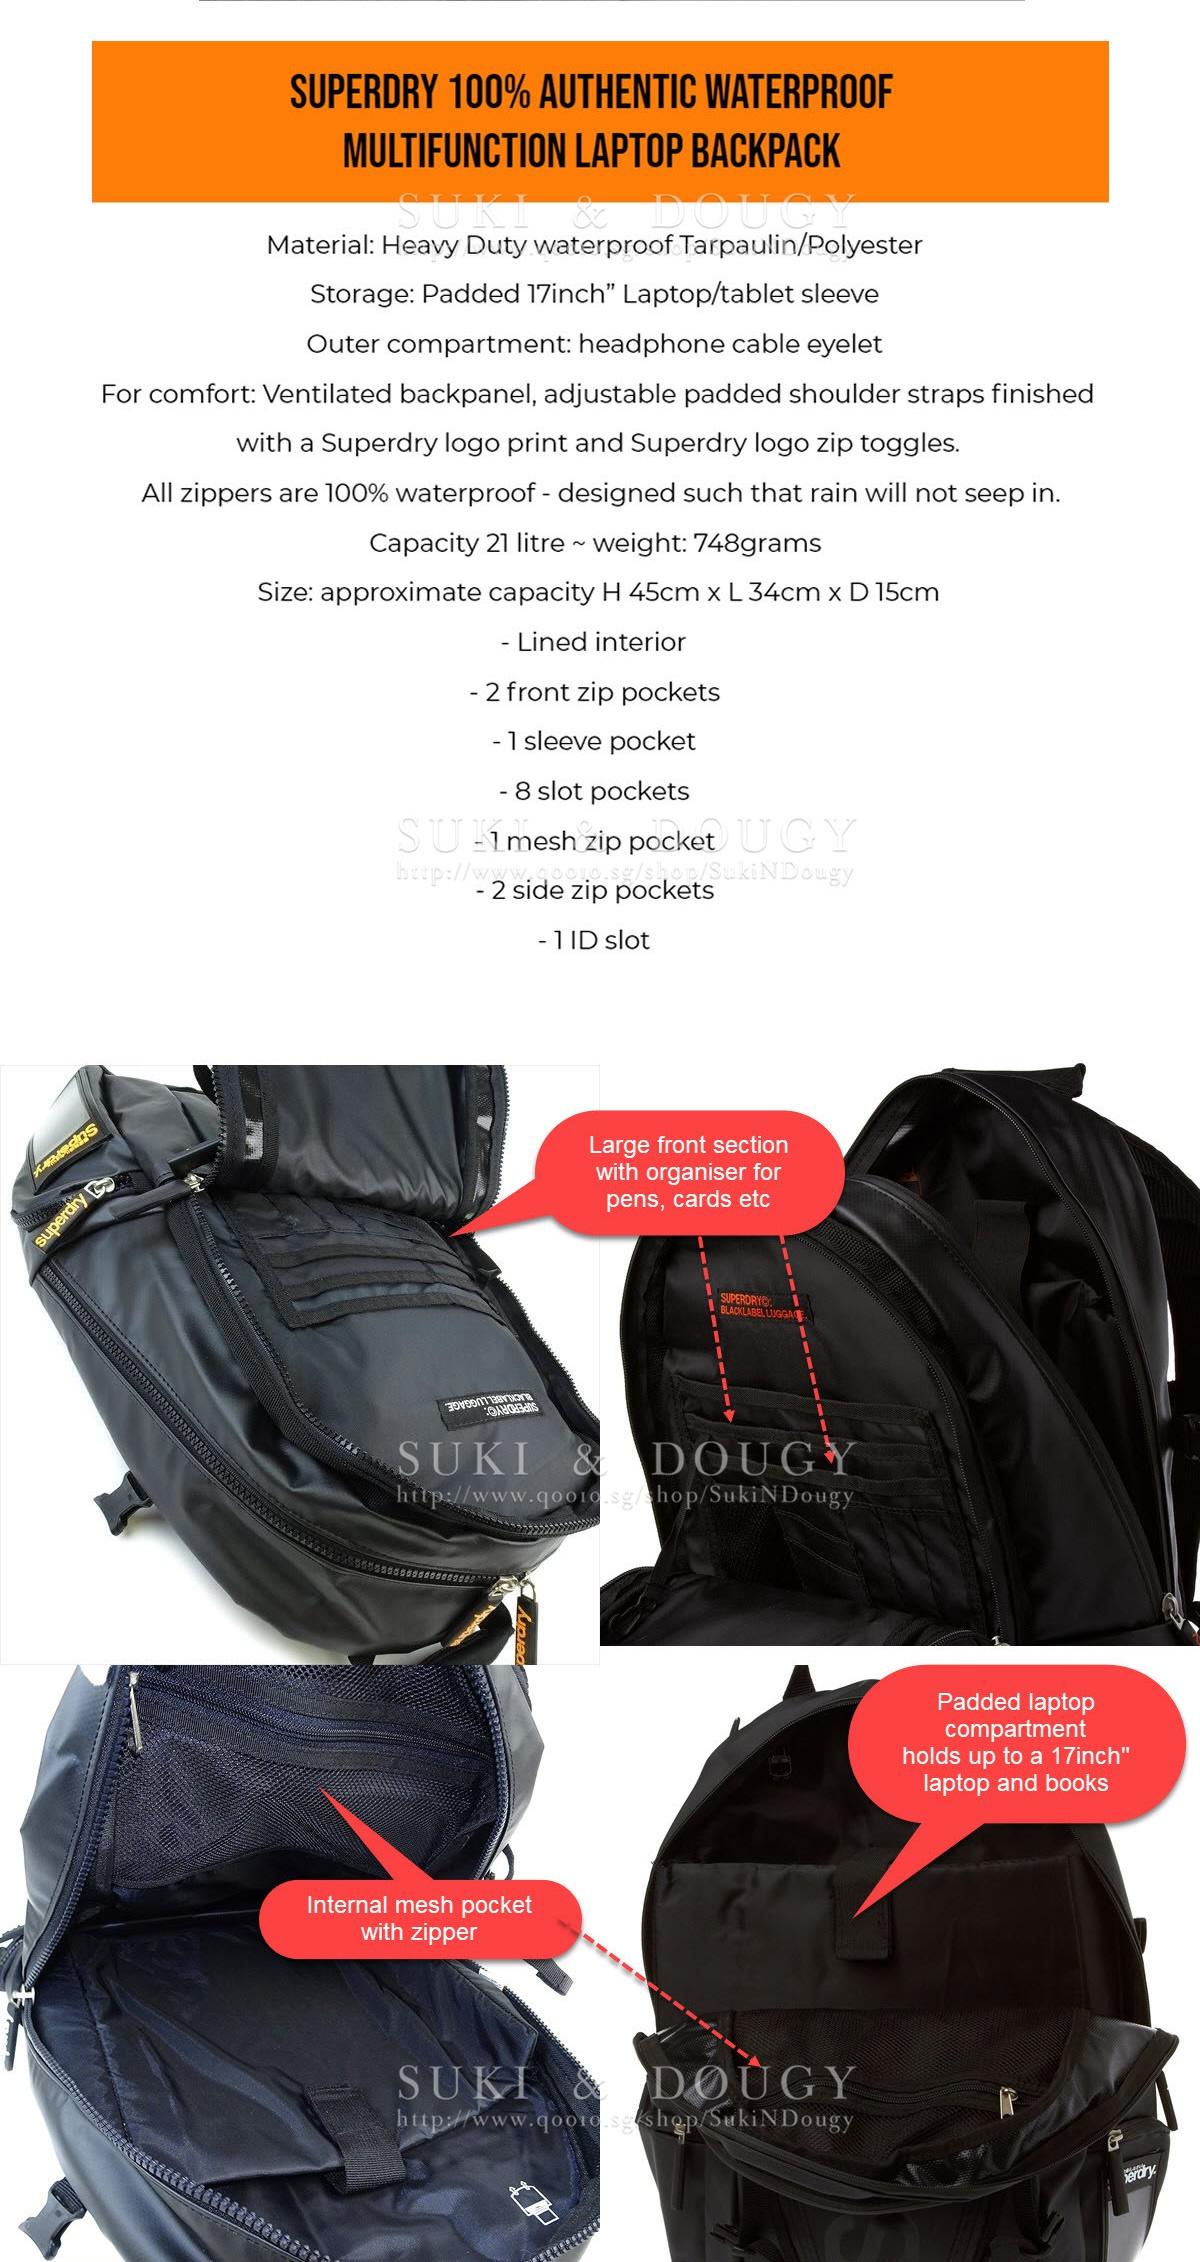 e019d6a7e17b ... Size  approximate capacity H 45cm x L 34cm x D 15cm - Lined interior -  2 front zip pockets - 1 sleeve pocket - 8 slot pockets - 1 mesh zip pocket